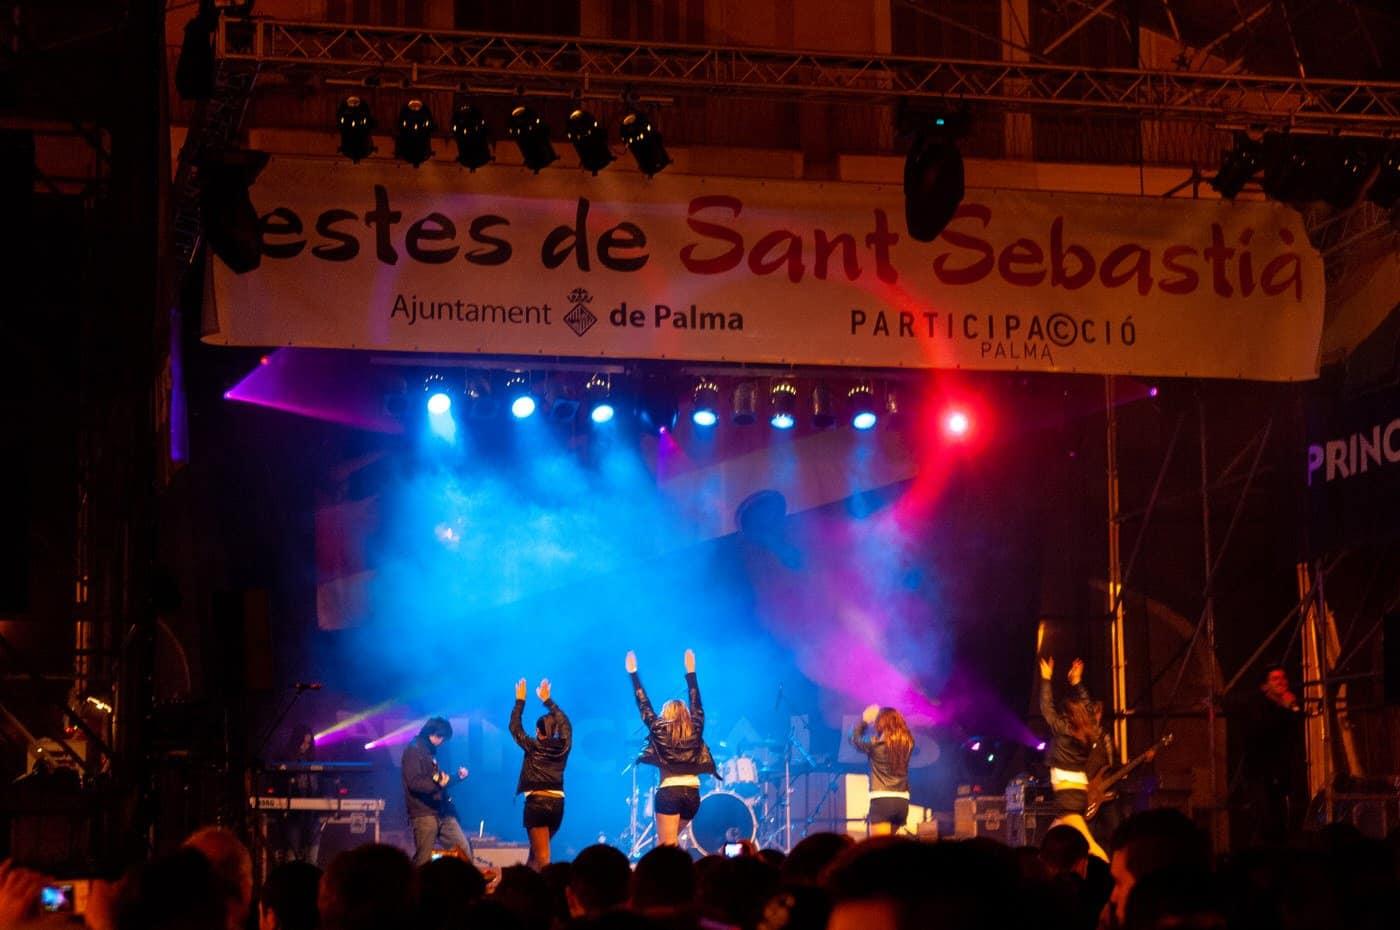 Ordentlich was los im Januar in Palma – Fiesta Sant Sebastián